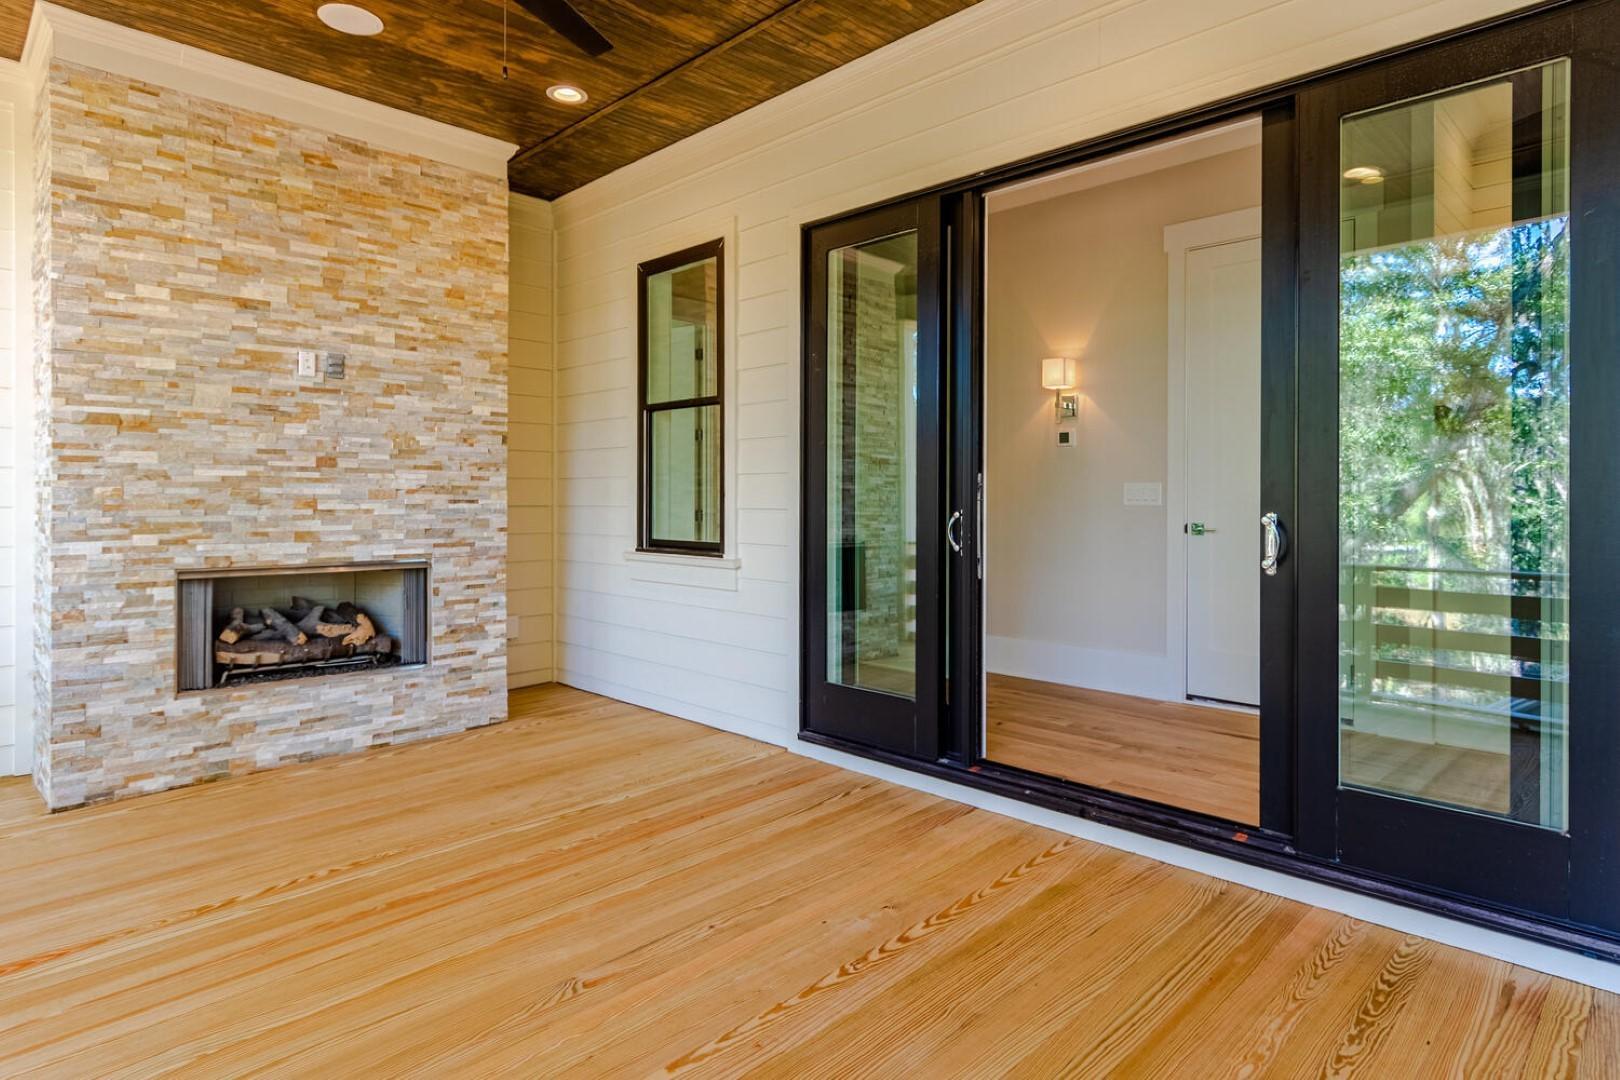 Scanlonville Homes For Sale - 156 5th, Mount Pleasant, SC - 45